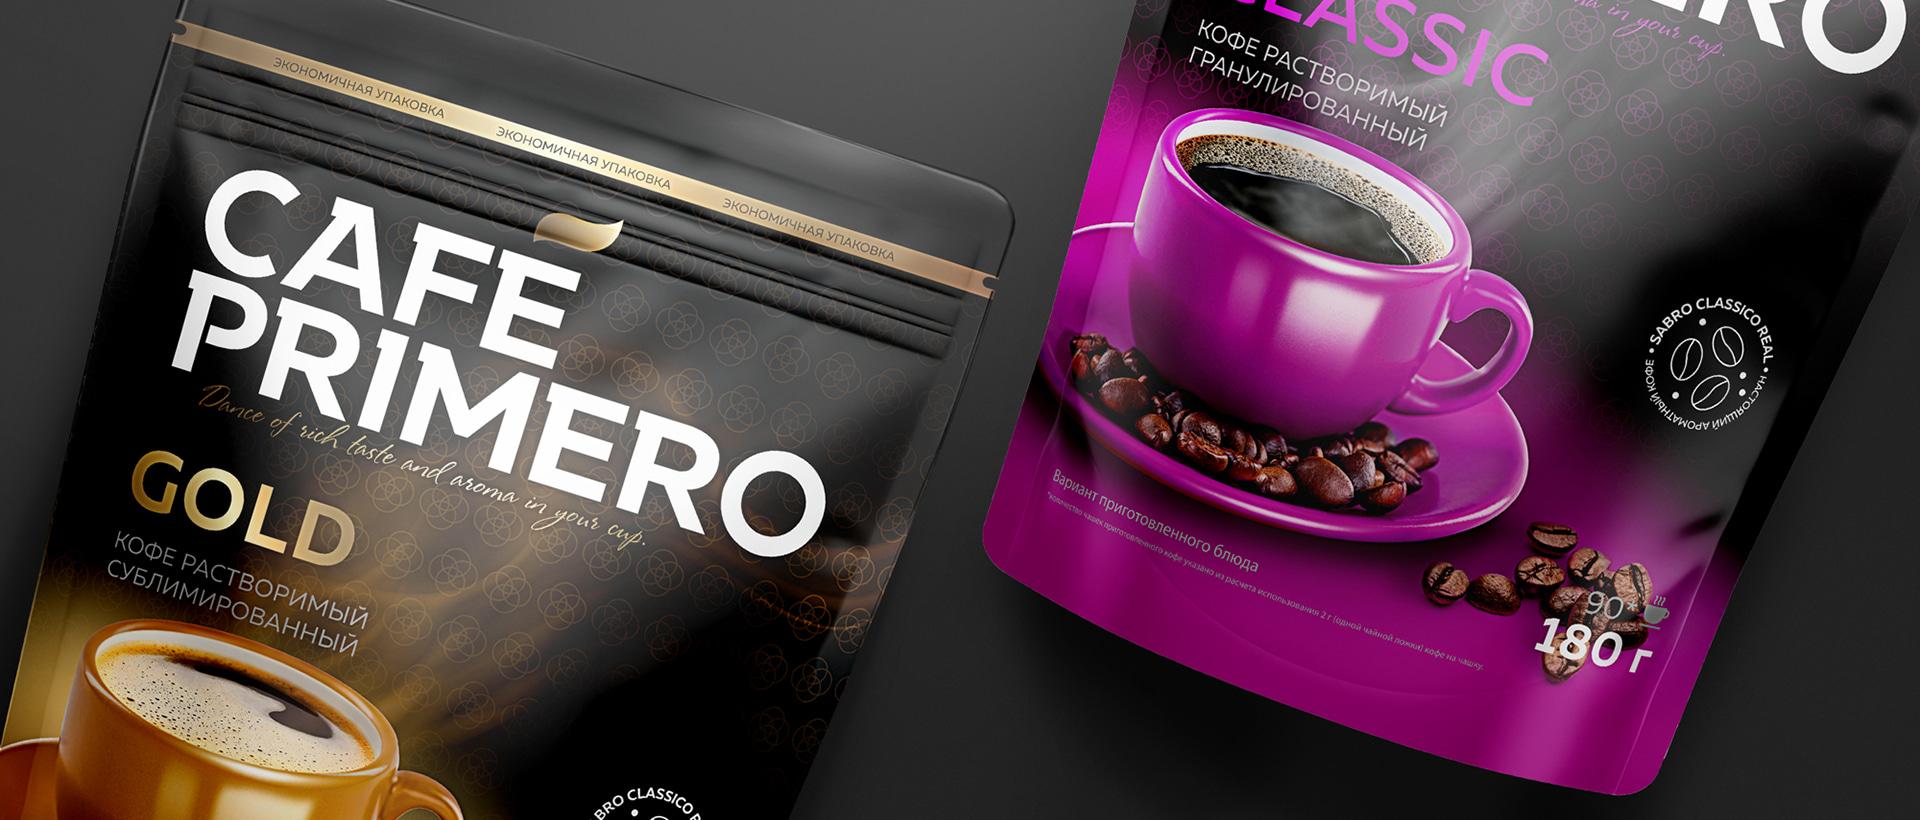 Cafe Primero image